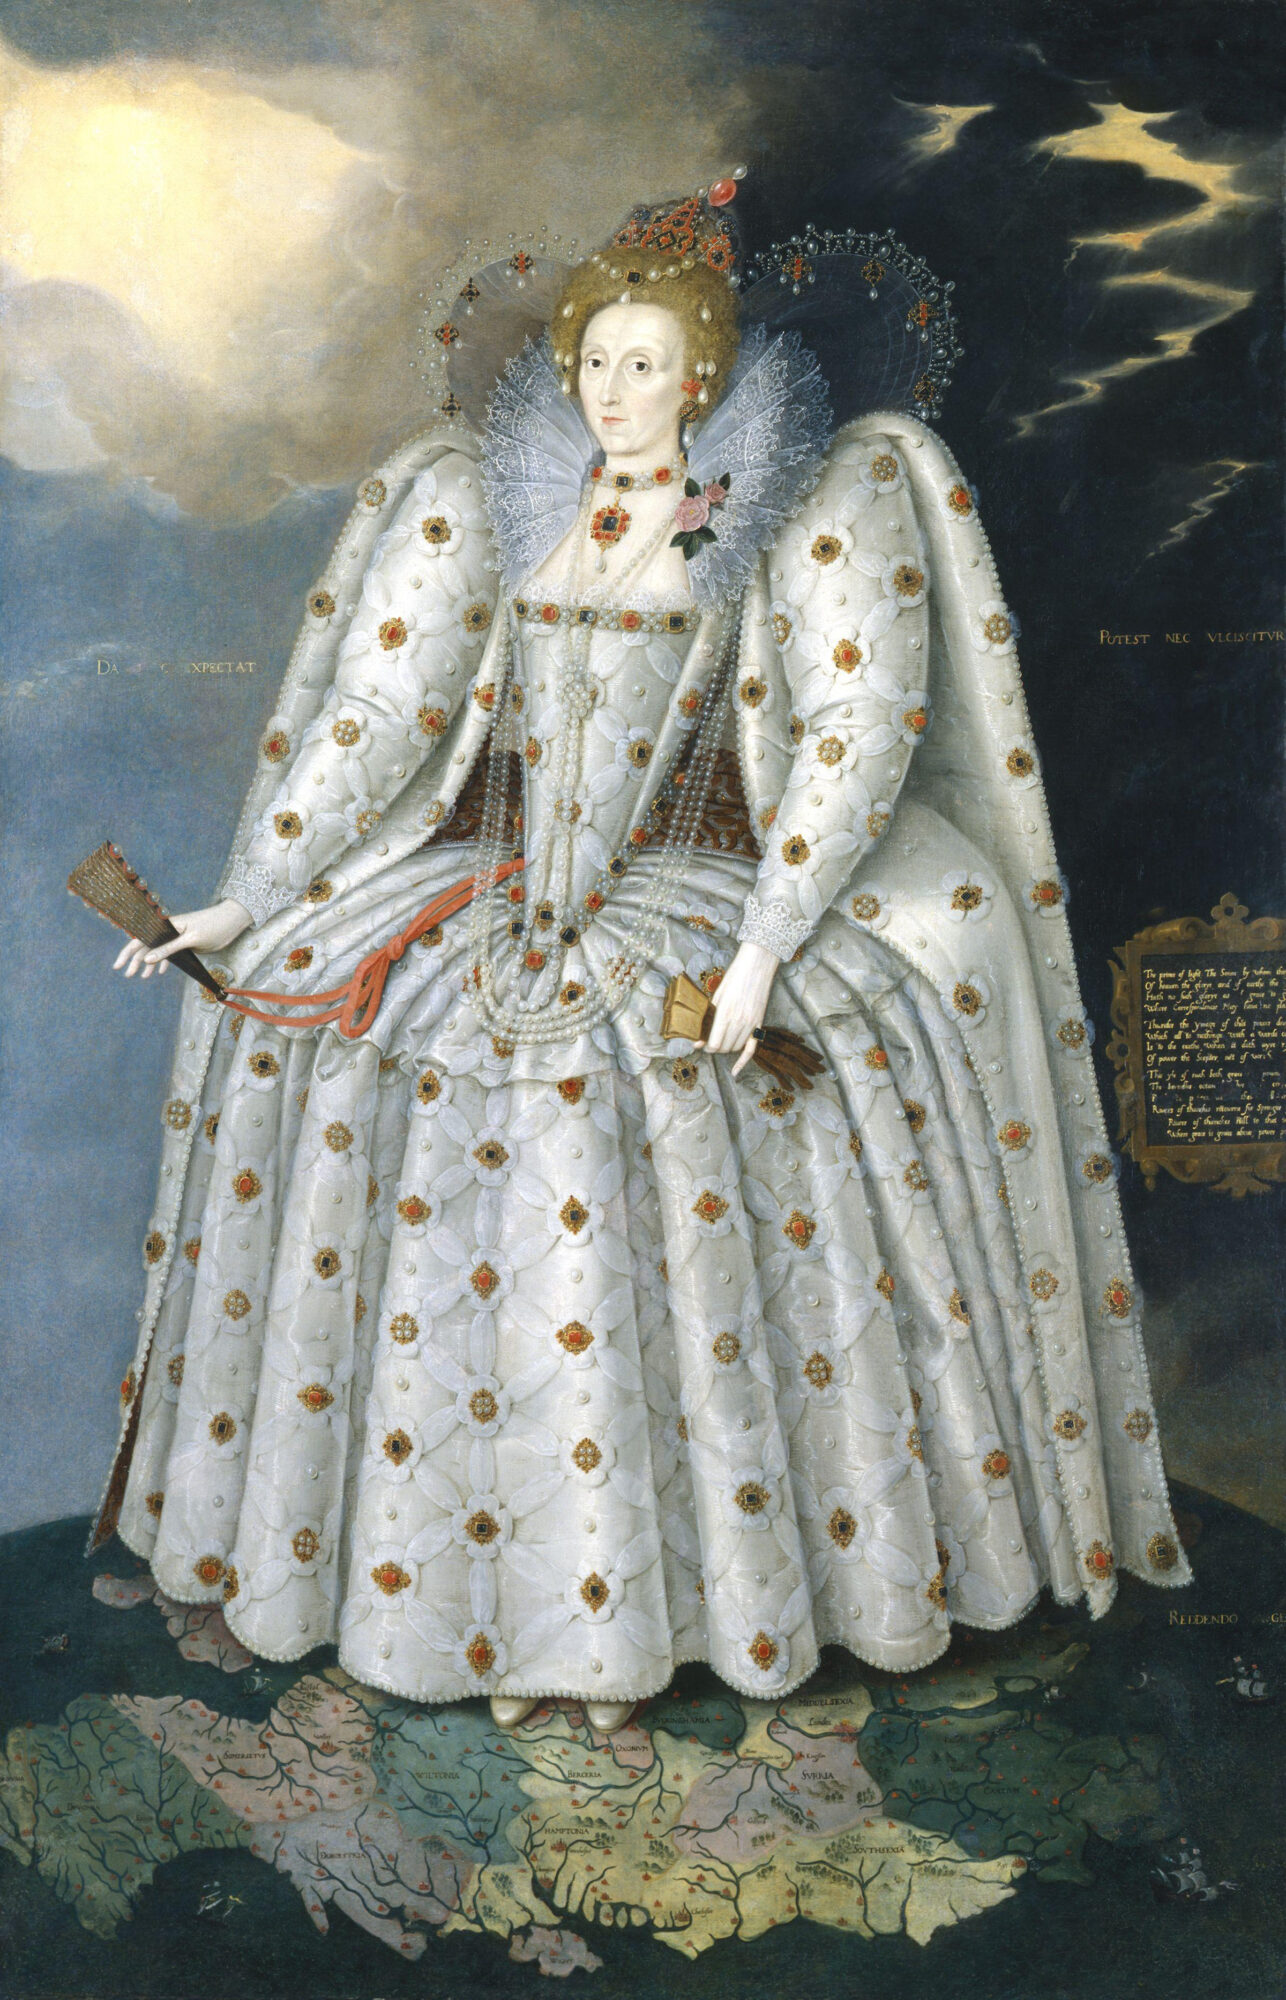 Marcus Gheeraerts der Jüngere 1592 Elizabeth I. National Portrait Gallery London.